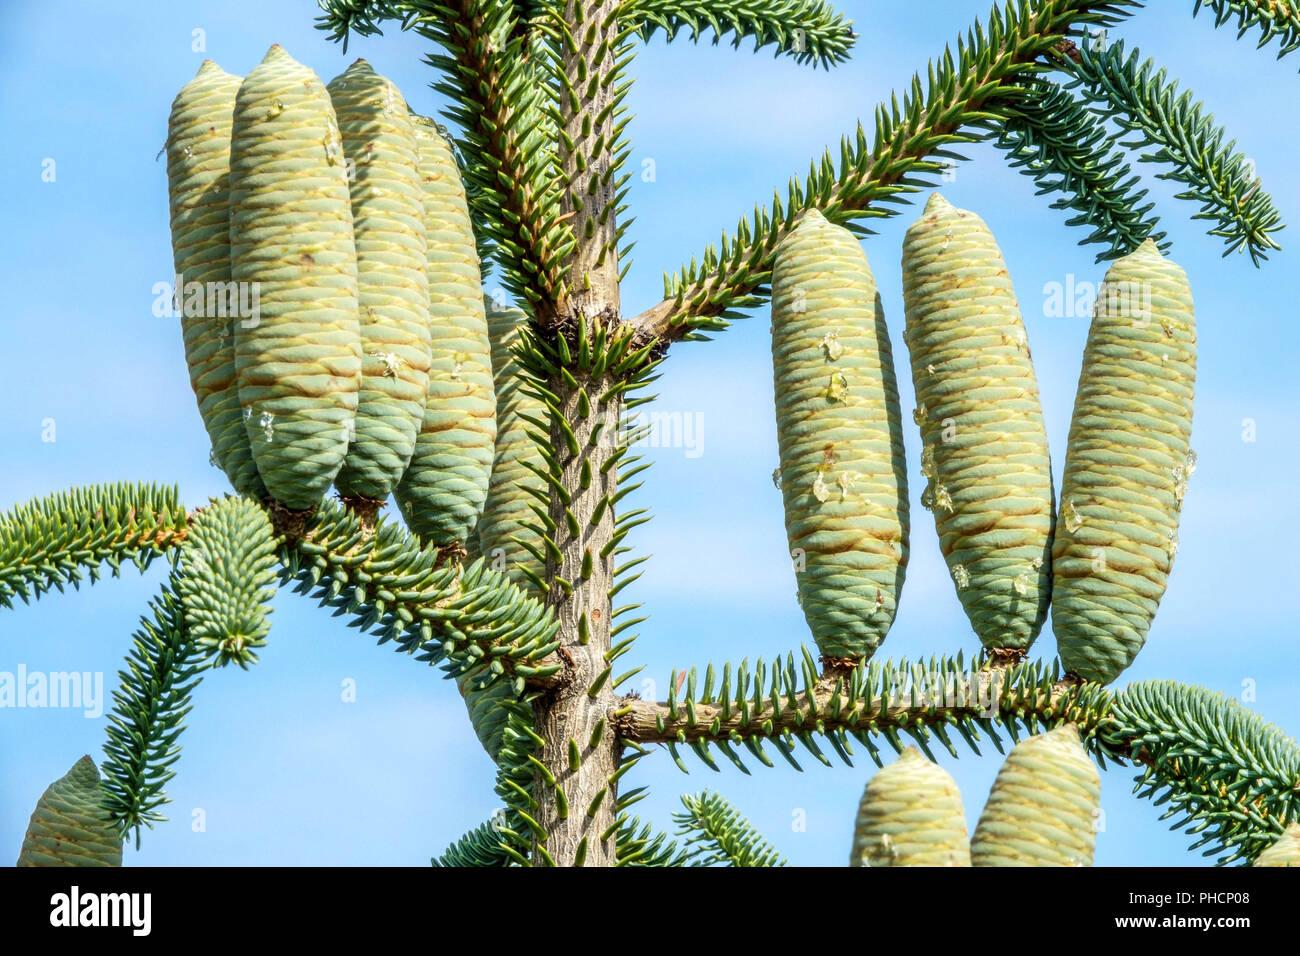 Cones Abies Pinsapo Fastigiata Stock Photo 217254248 Alamy